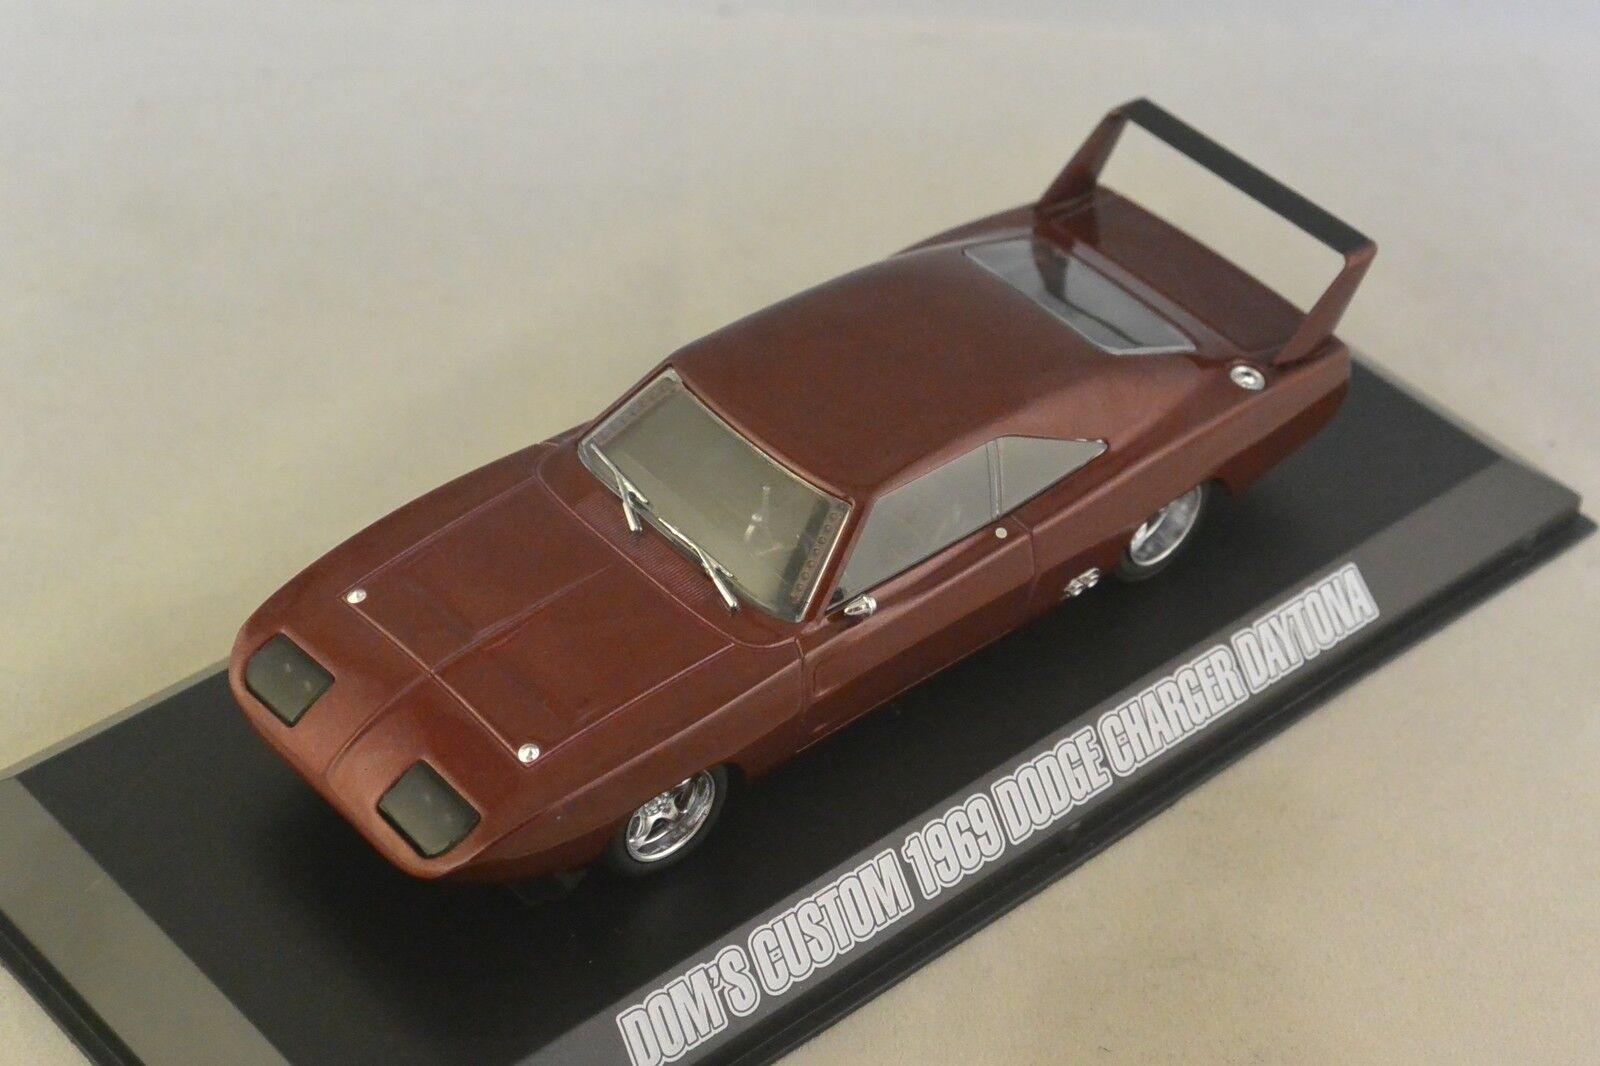 vertLIGHT 86221 - Dodge charger Daytona Fast and Furious 6 2013 1 43